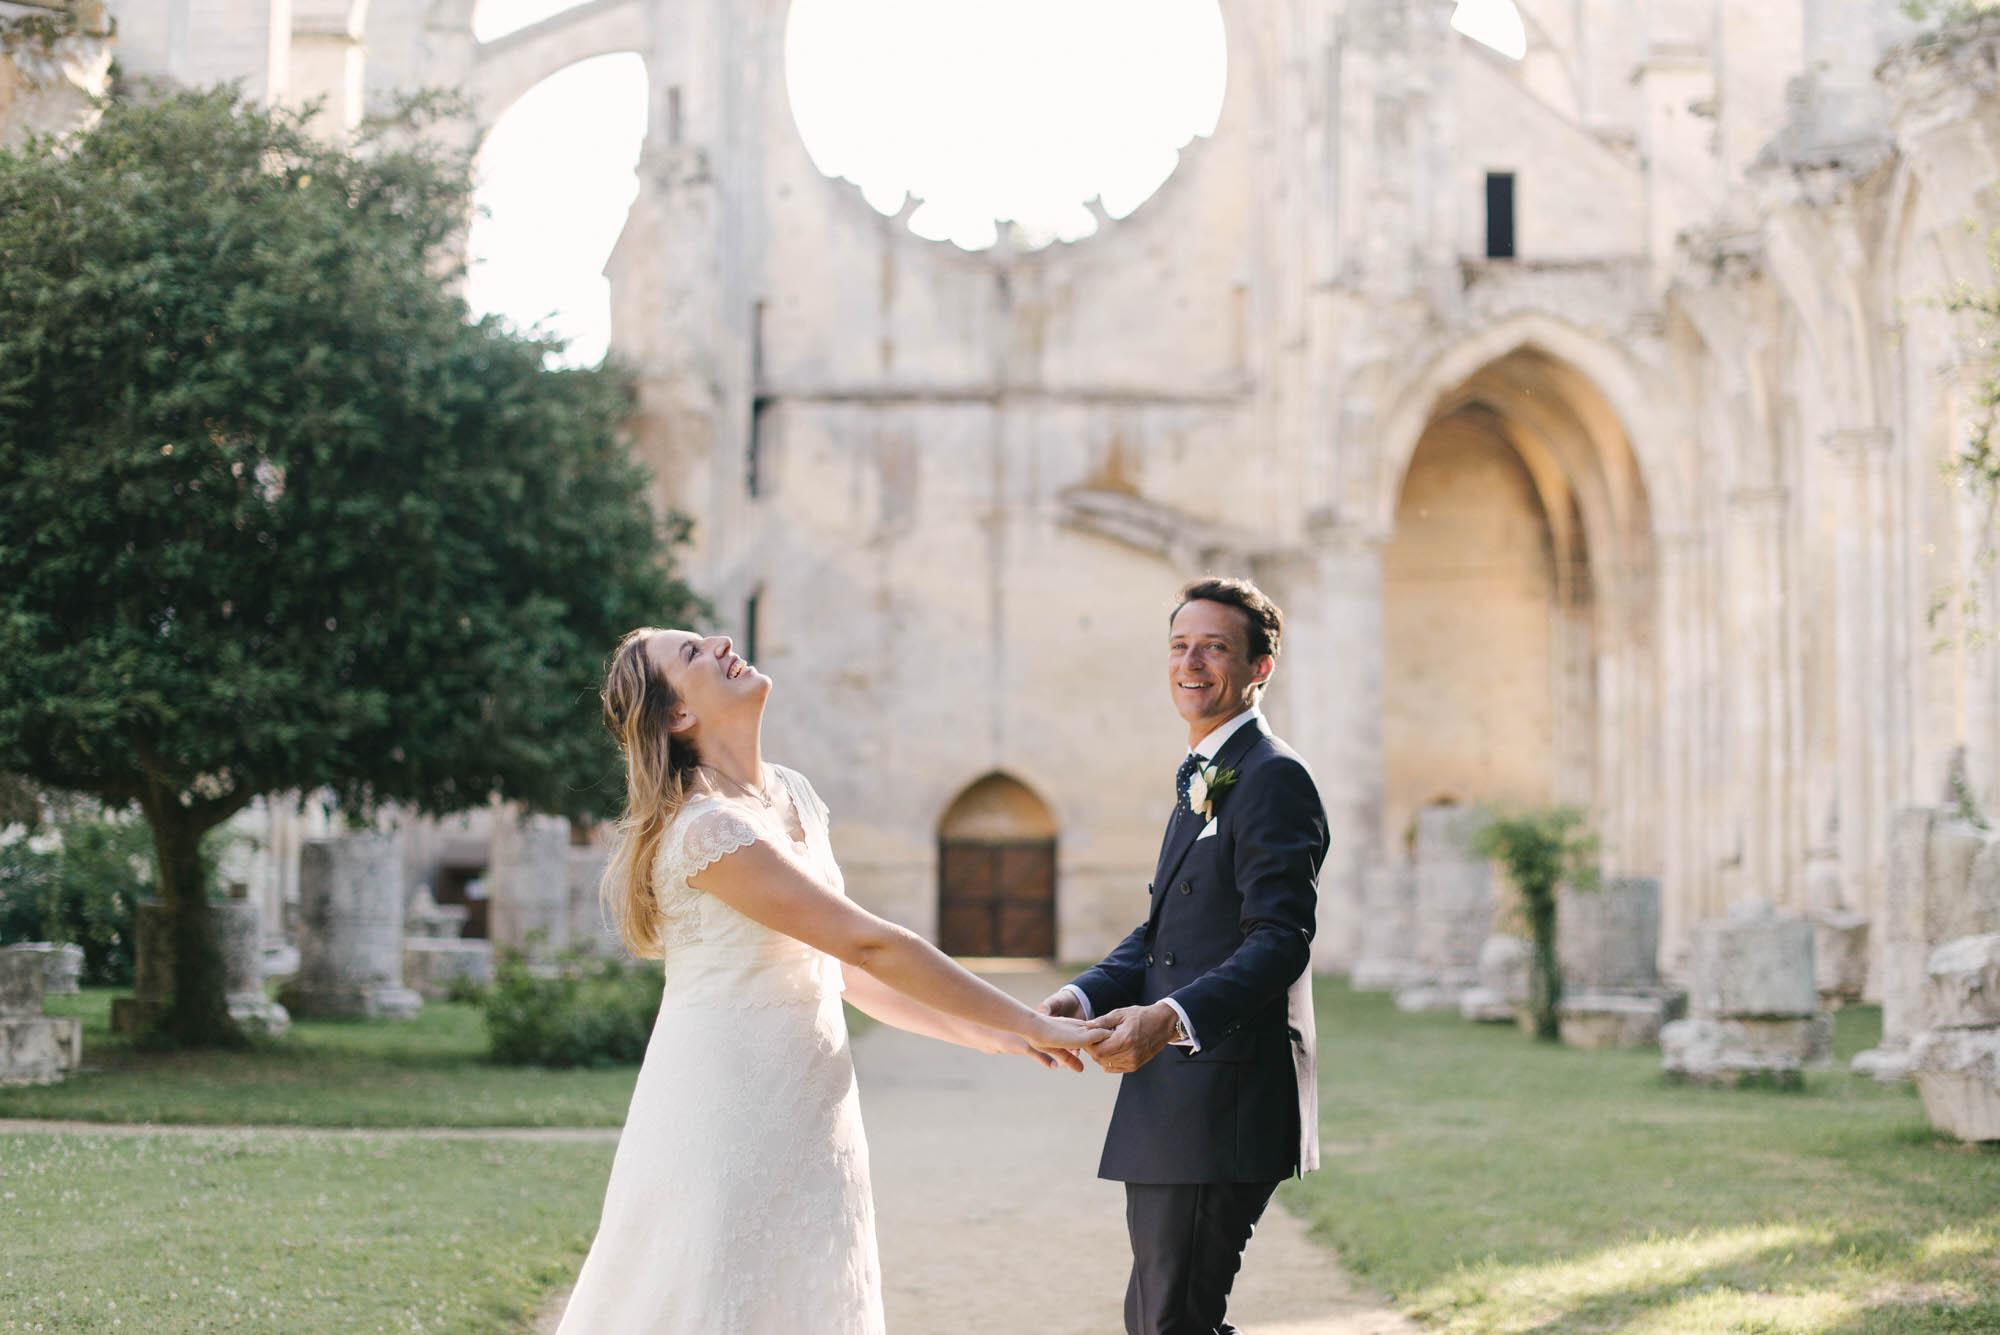 Lisebery-photographe-mariage-famille-grenoble-fontainebleau